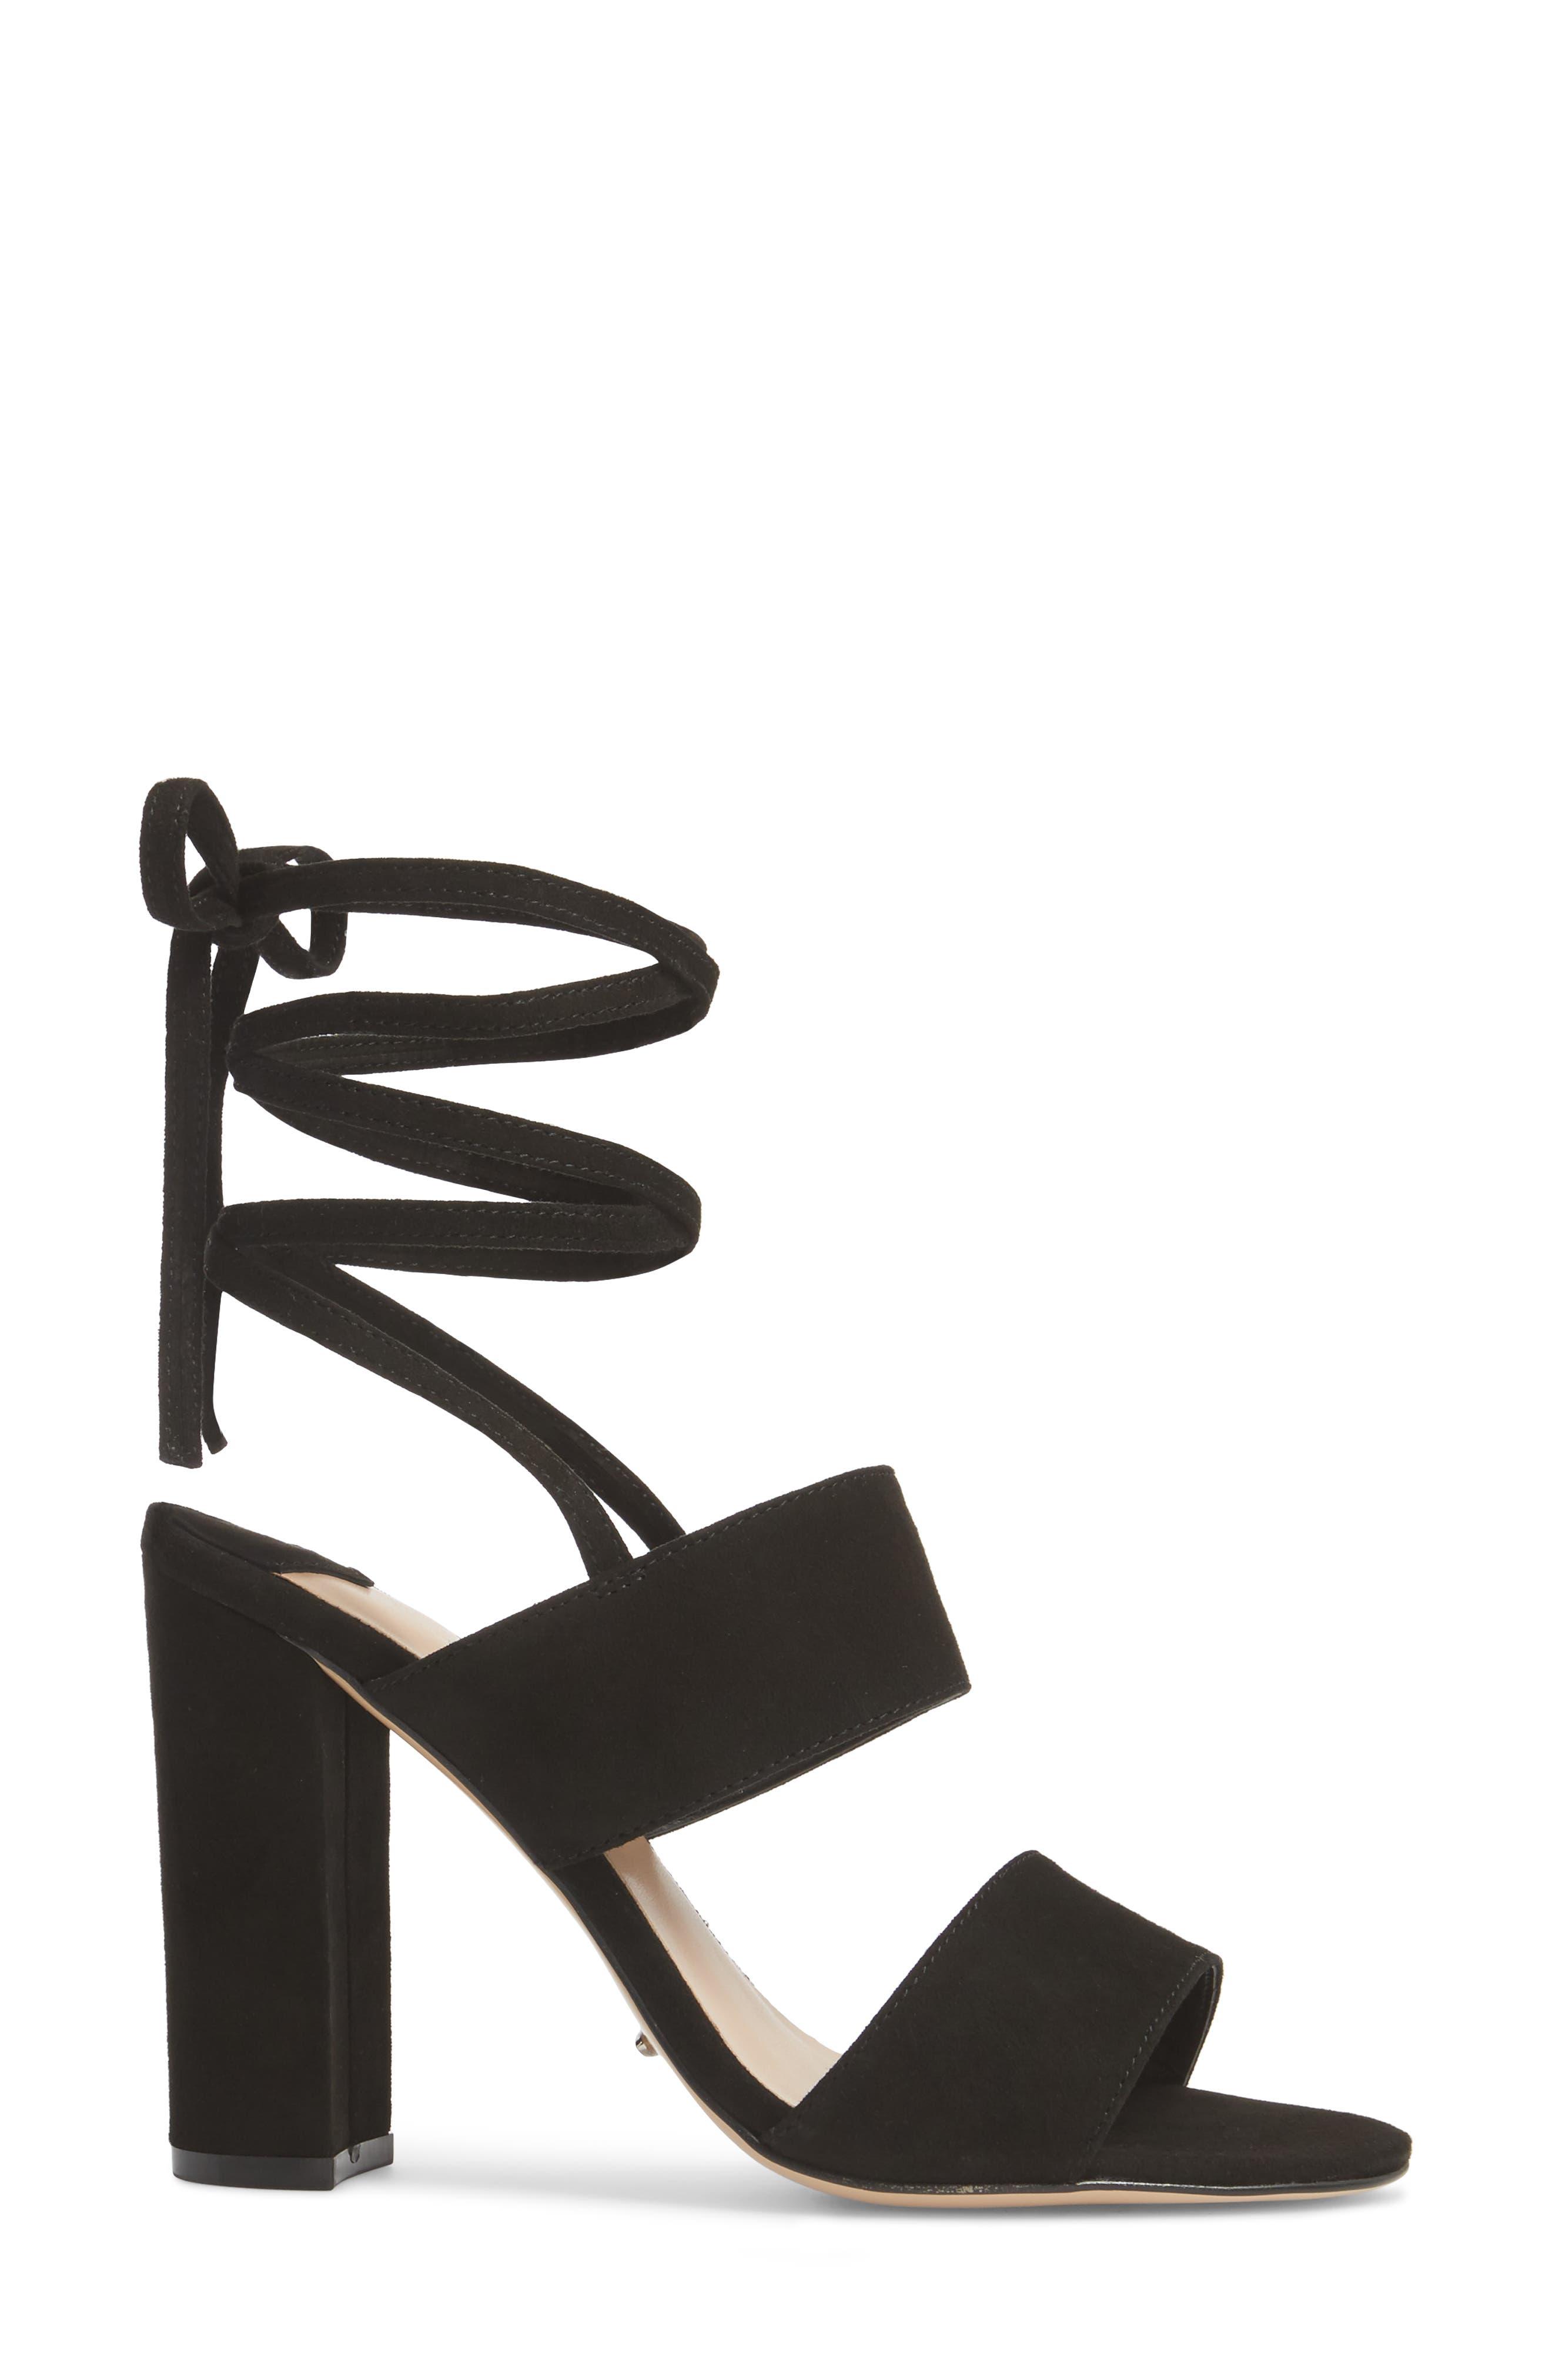 Kiko Ankle Tie Sandal,                             Alternate thumbnail 3, color,                             Black Suede